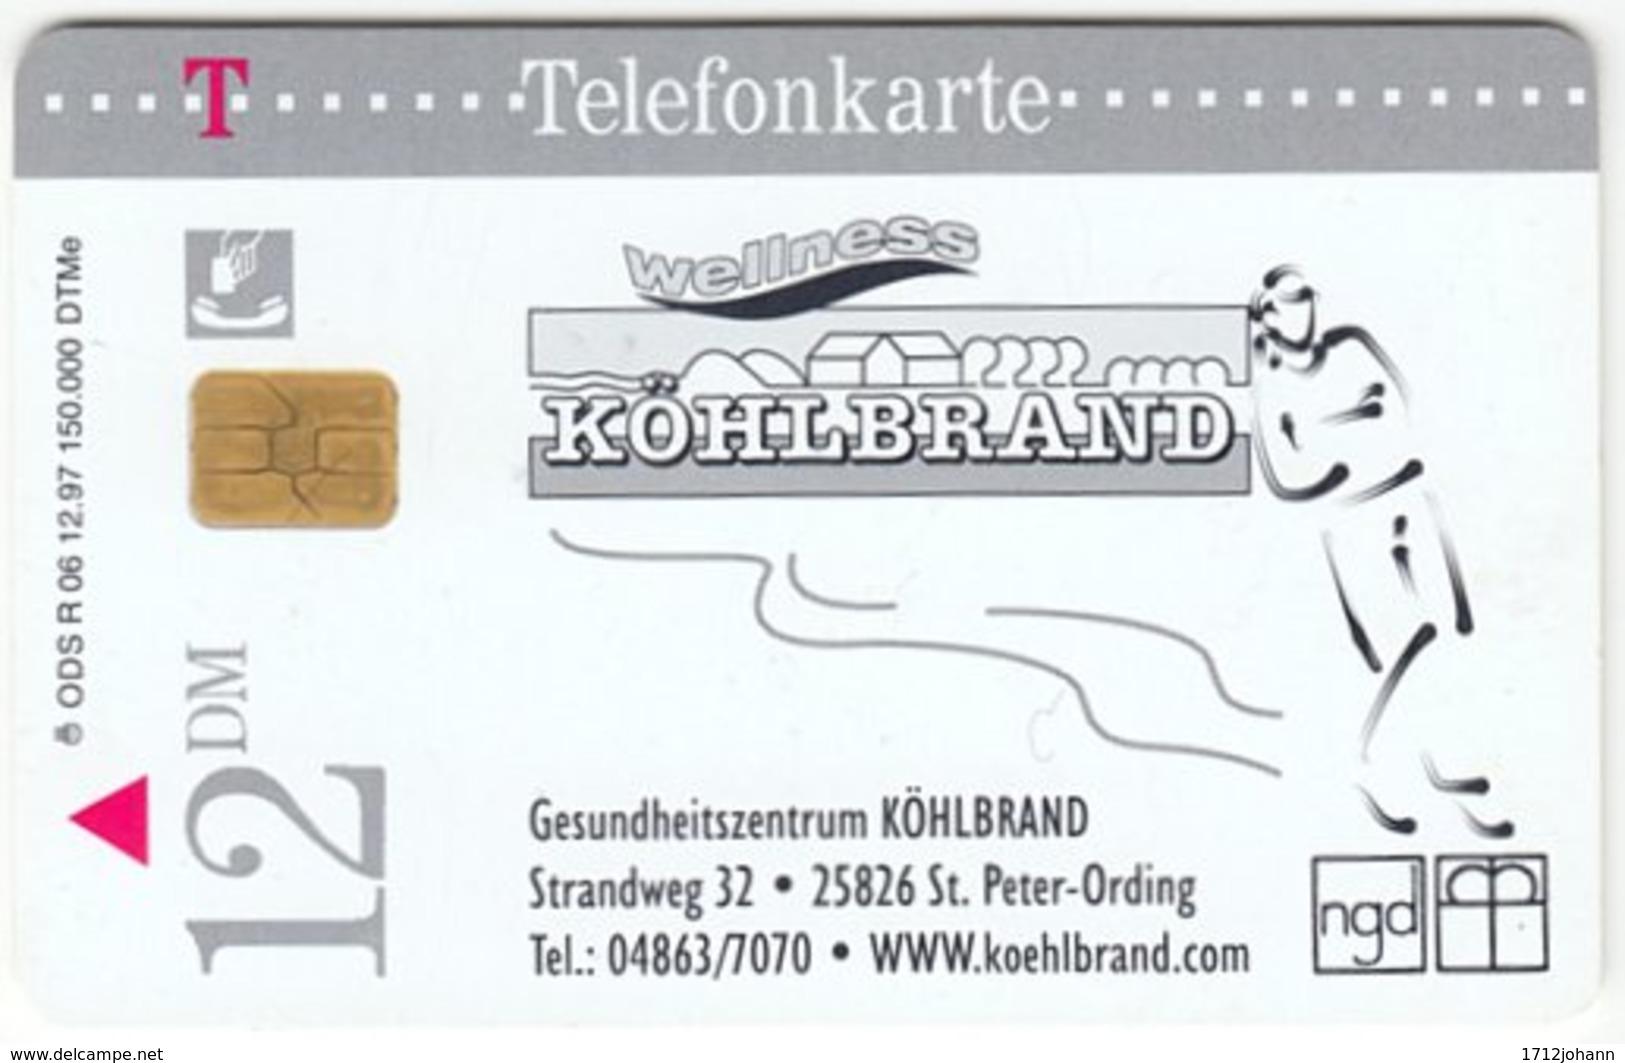 GERMANY R-Serie A-200 - 06 12.97 - Leisure, Wellness - Used - R-Series: Regionale Schalterserie